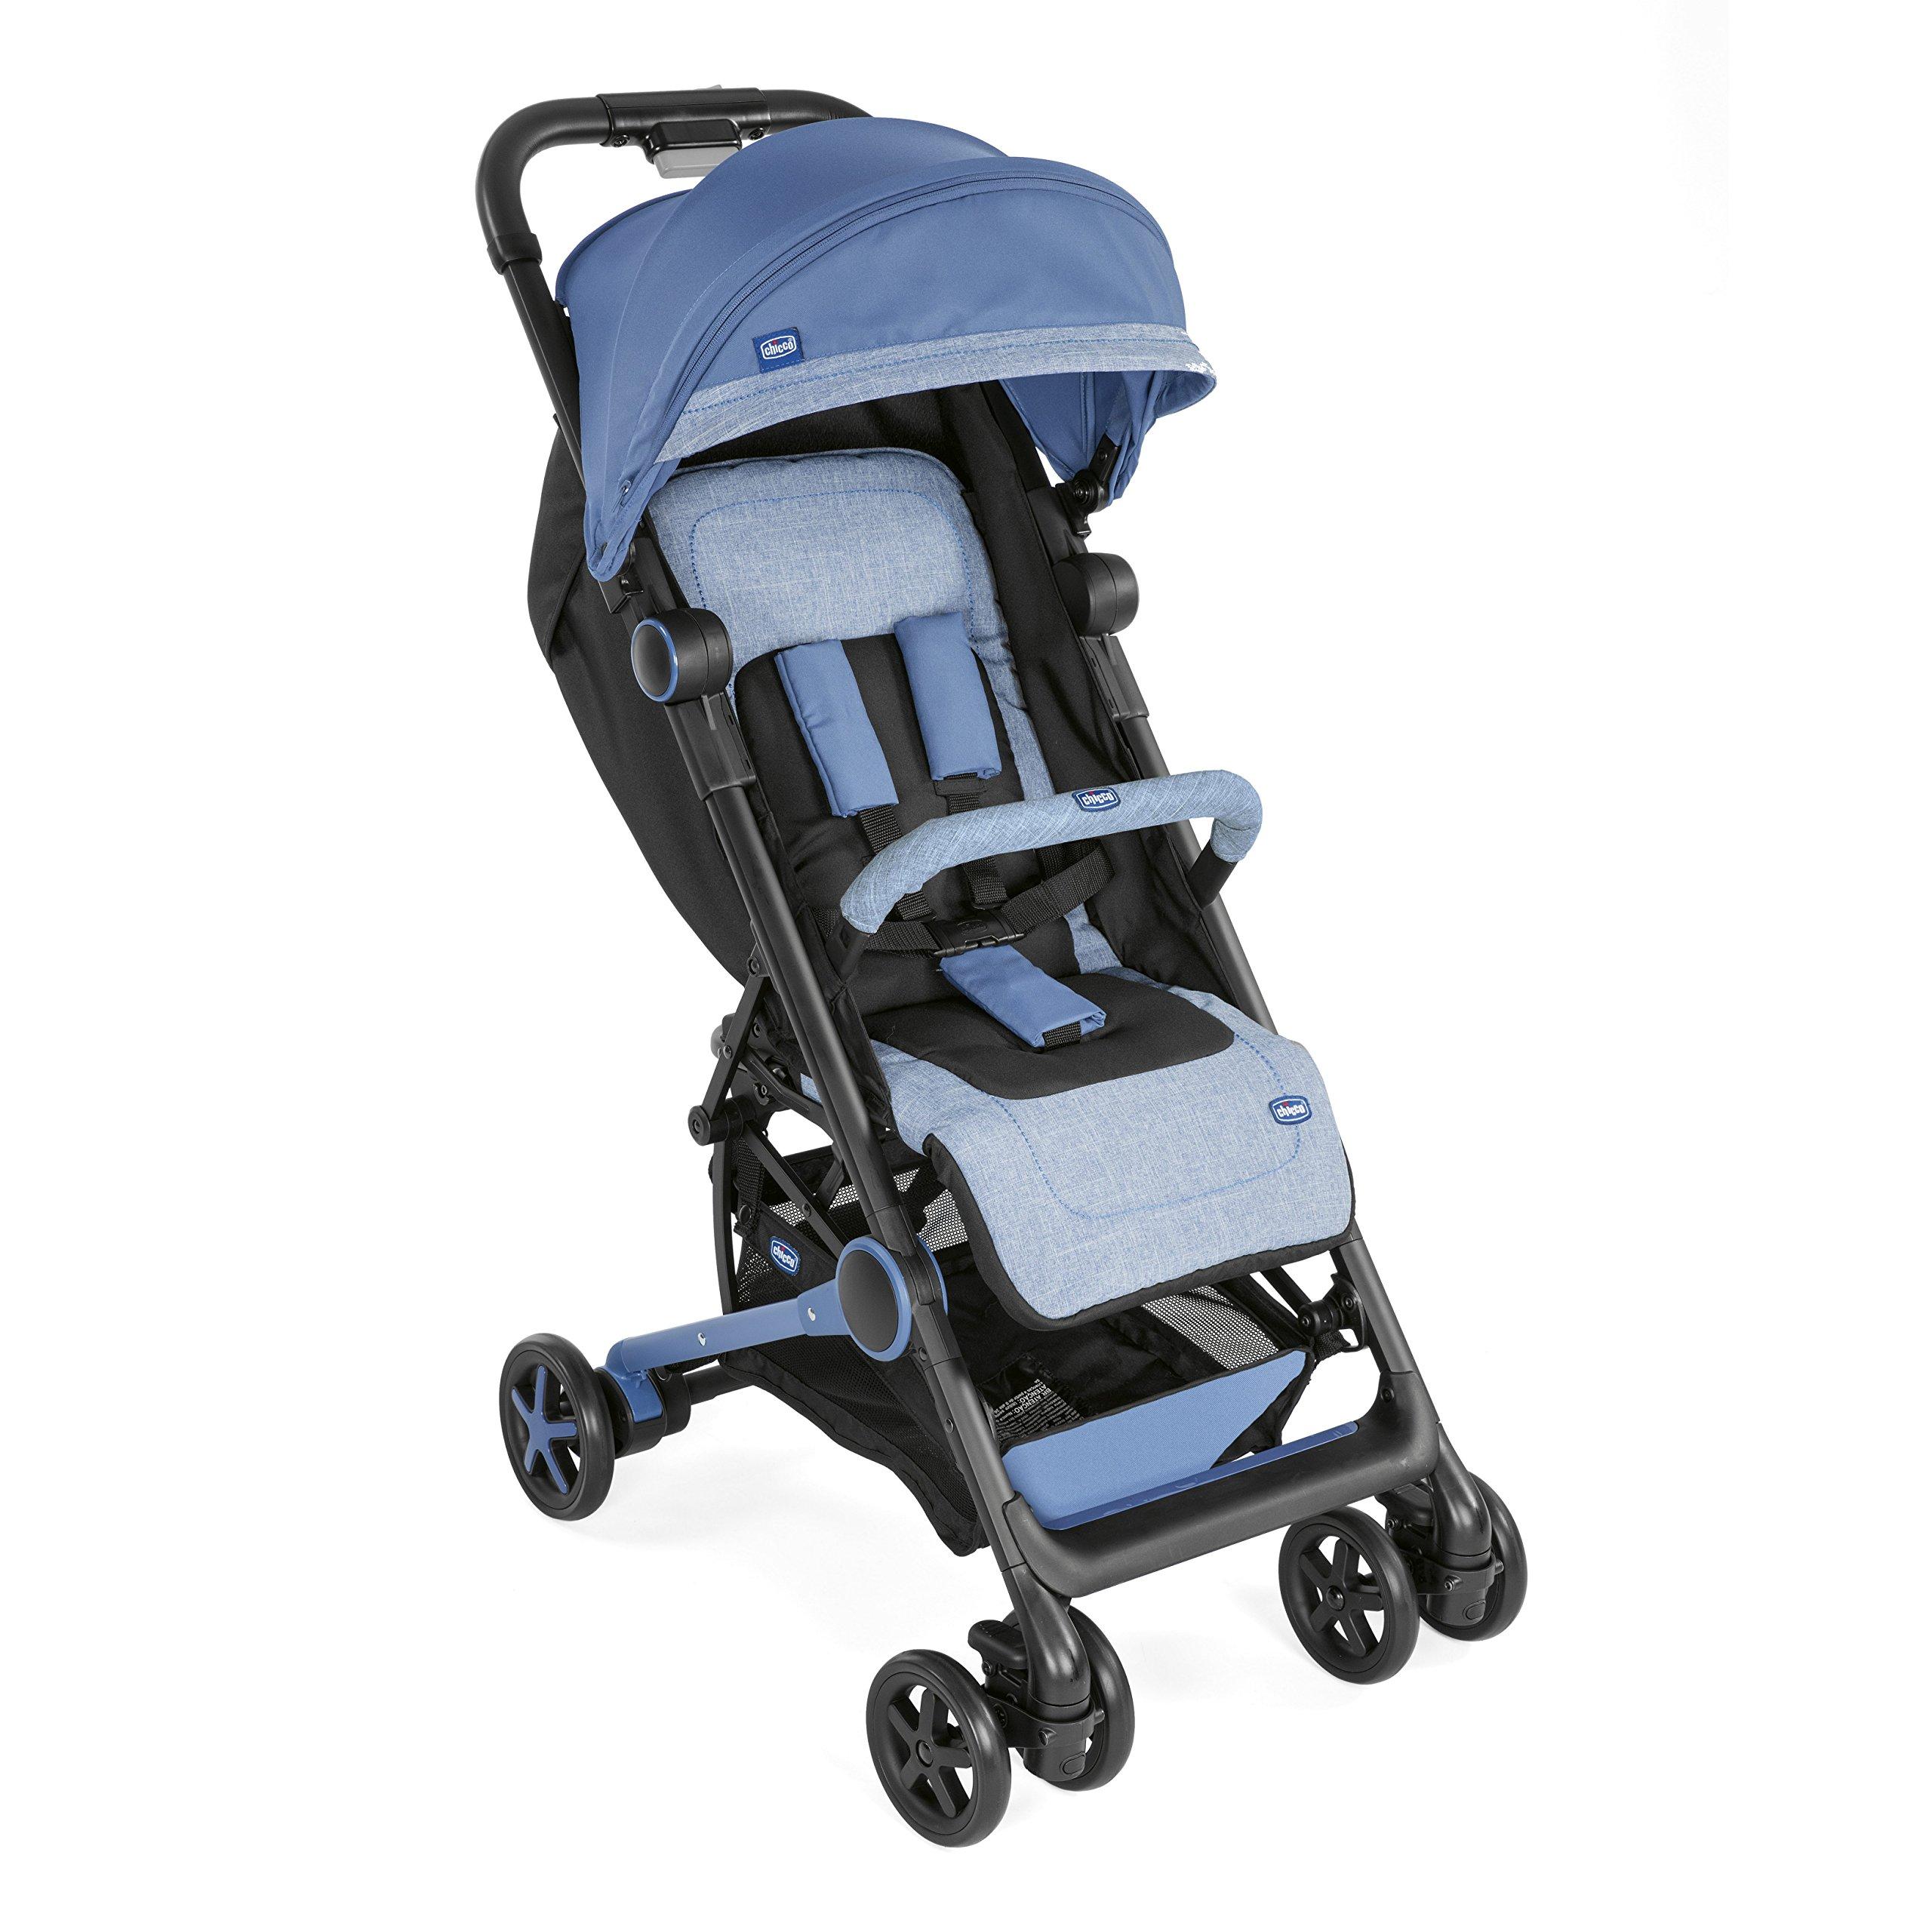 Chicco Miinimo2 - Silla de paseo ultracompacta y ligera, 6 kg, color azul product